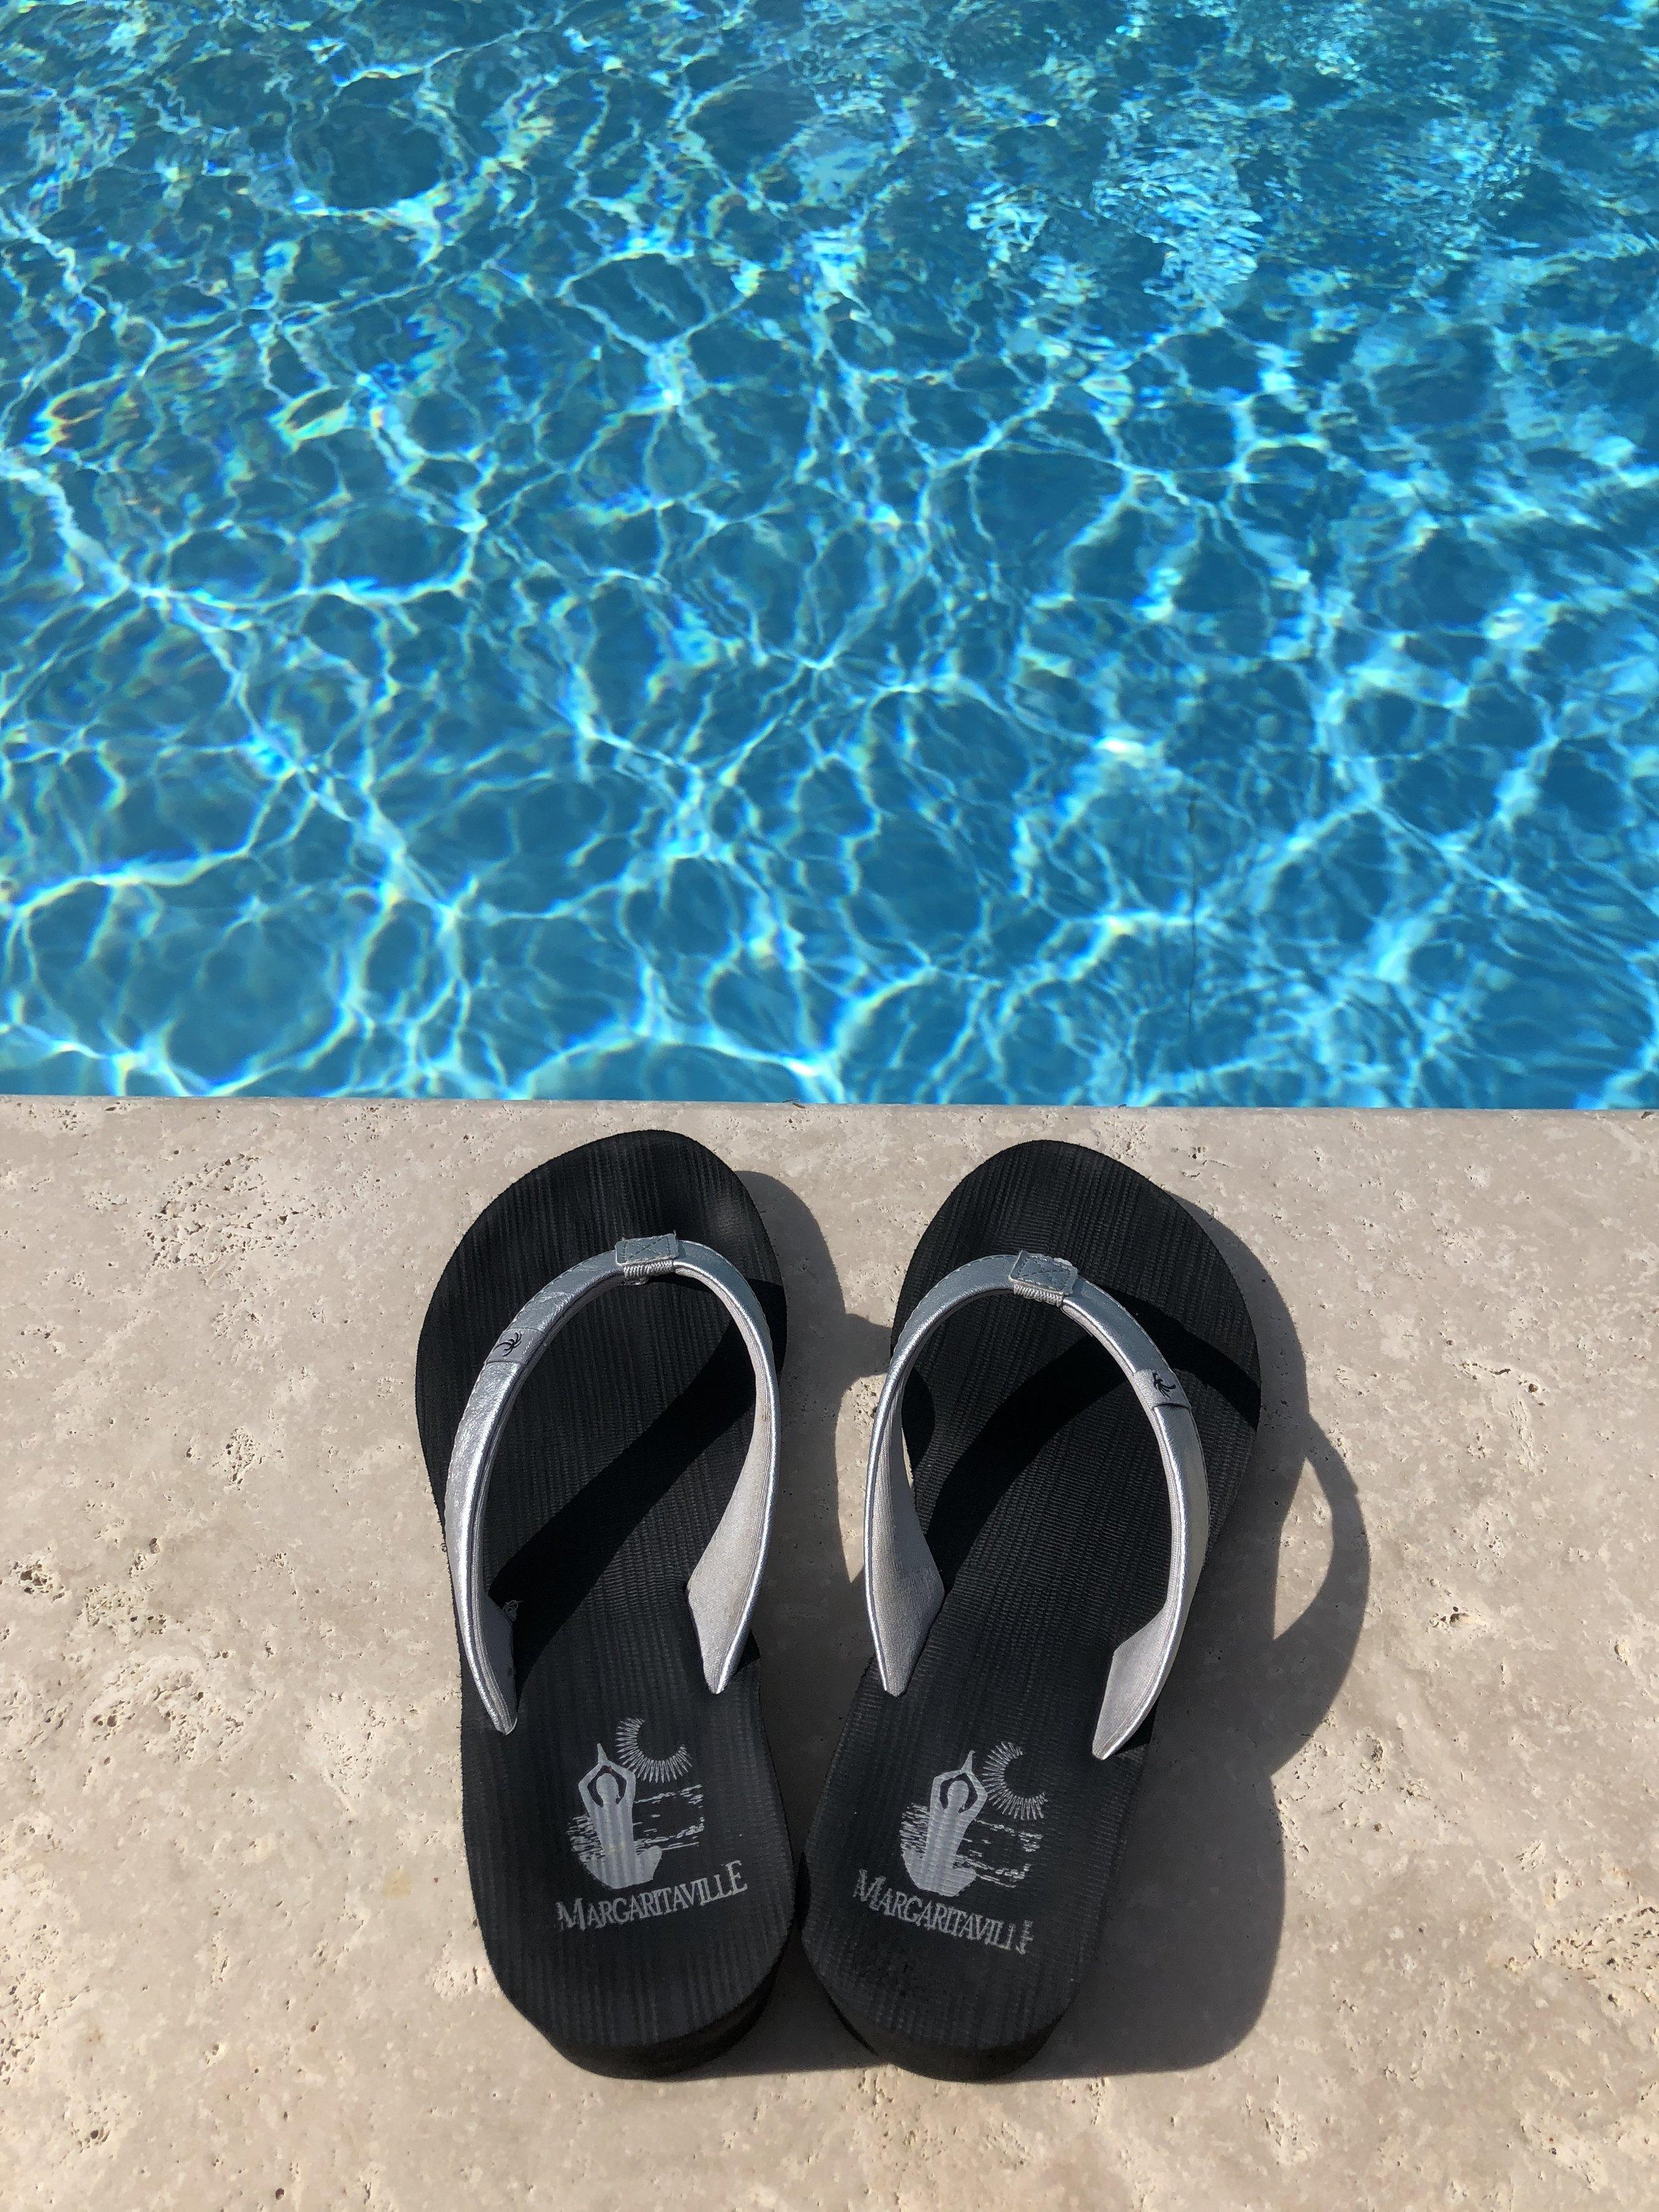 Glimsen-flip-flops-by-pool.jpg